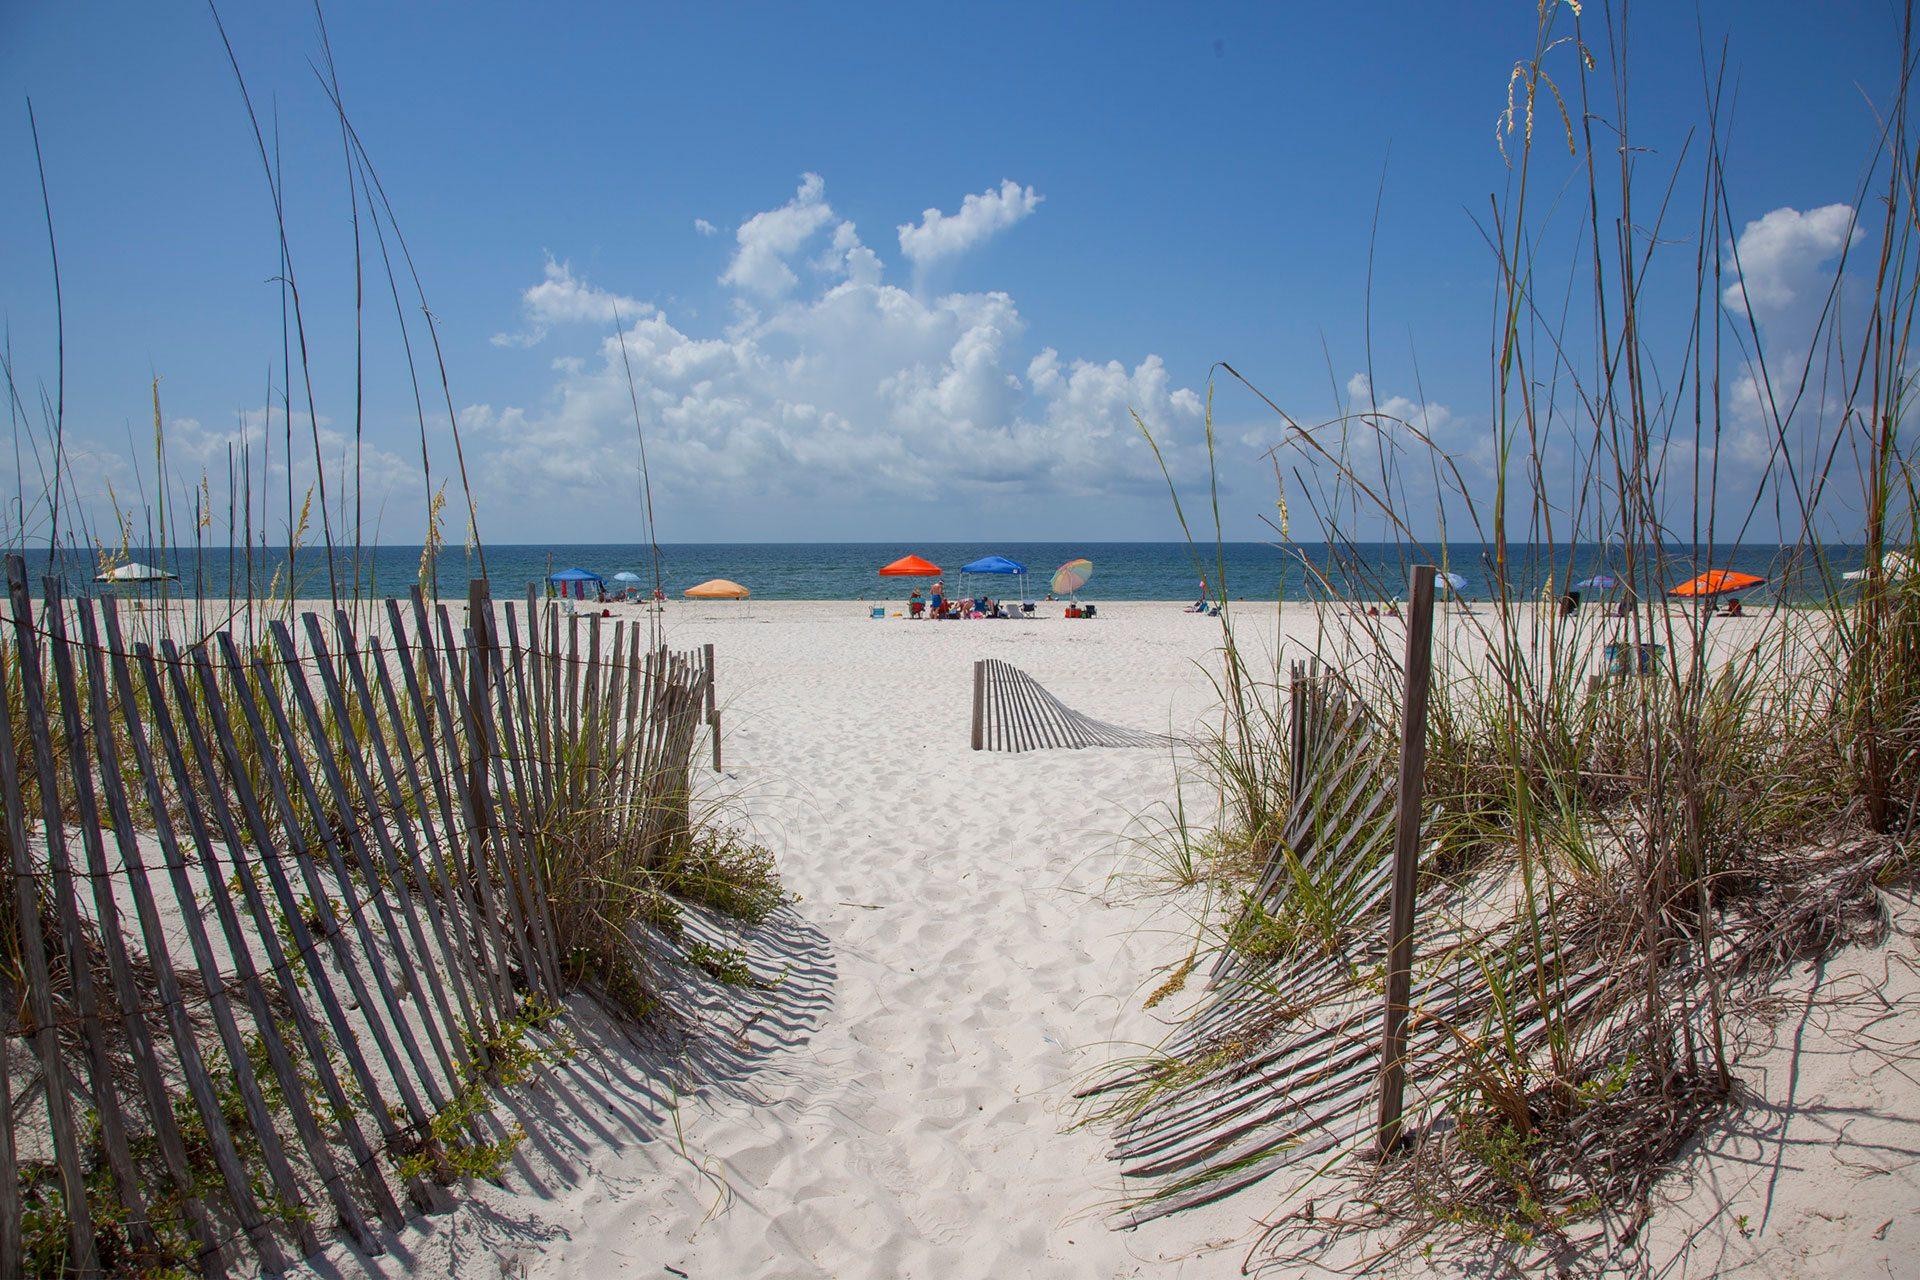 Wits-End-beach-scene-1